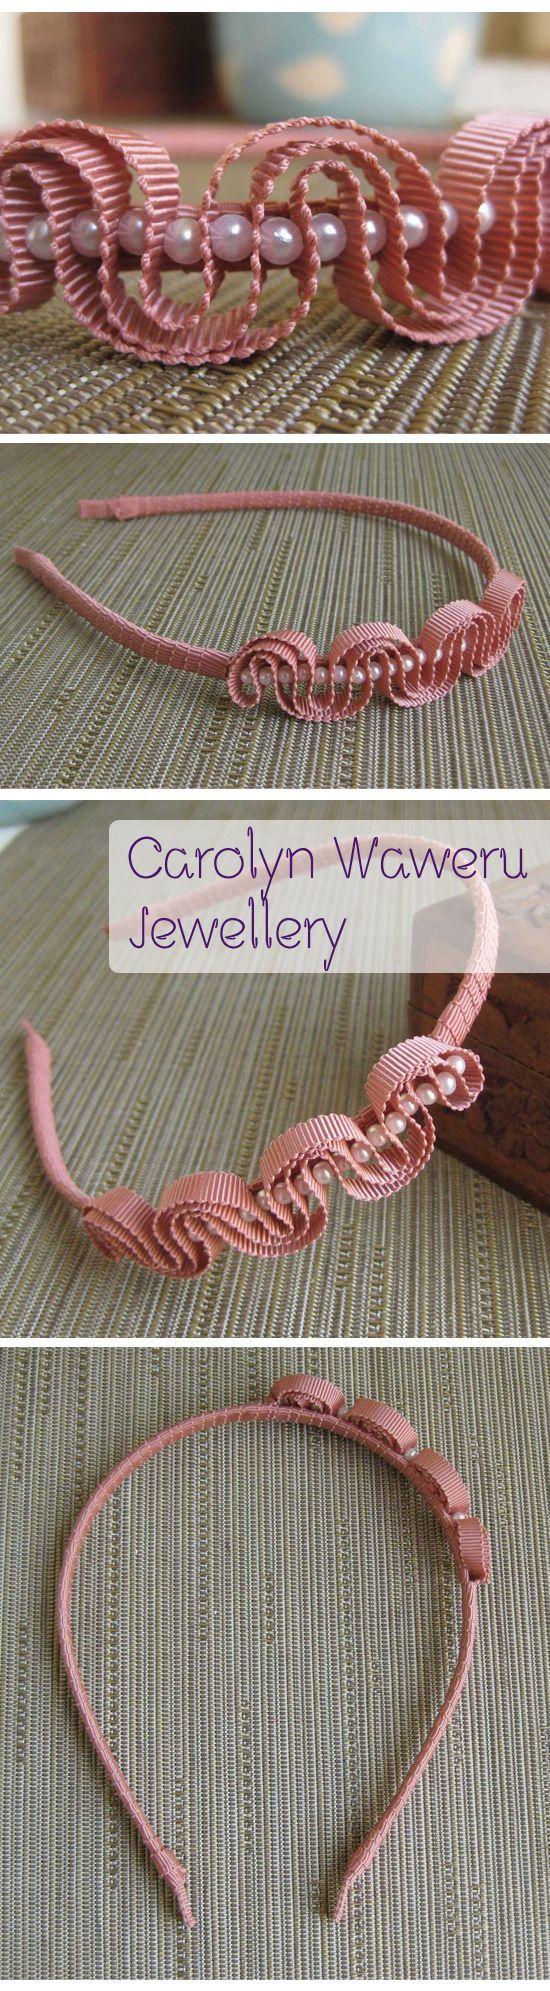 Diadema para la cabeza con cinta rosa ondulada y perlas  -   pink ribbon rippled with pearls on a headband: